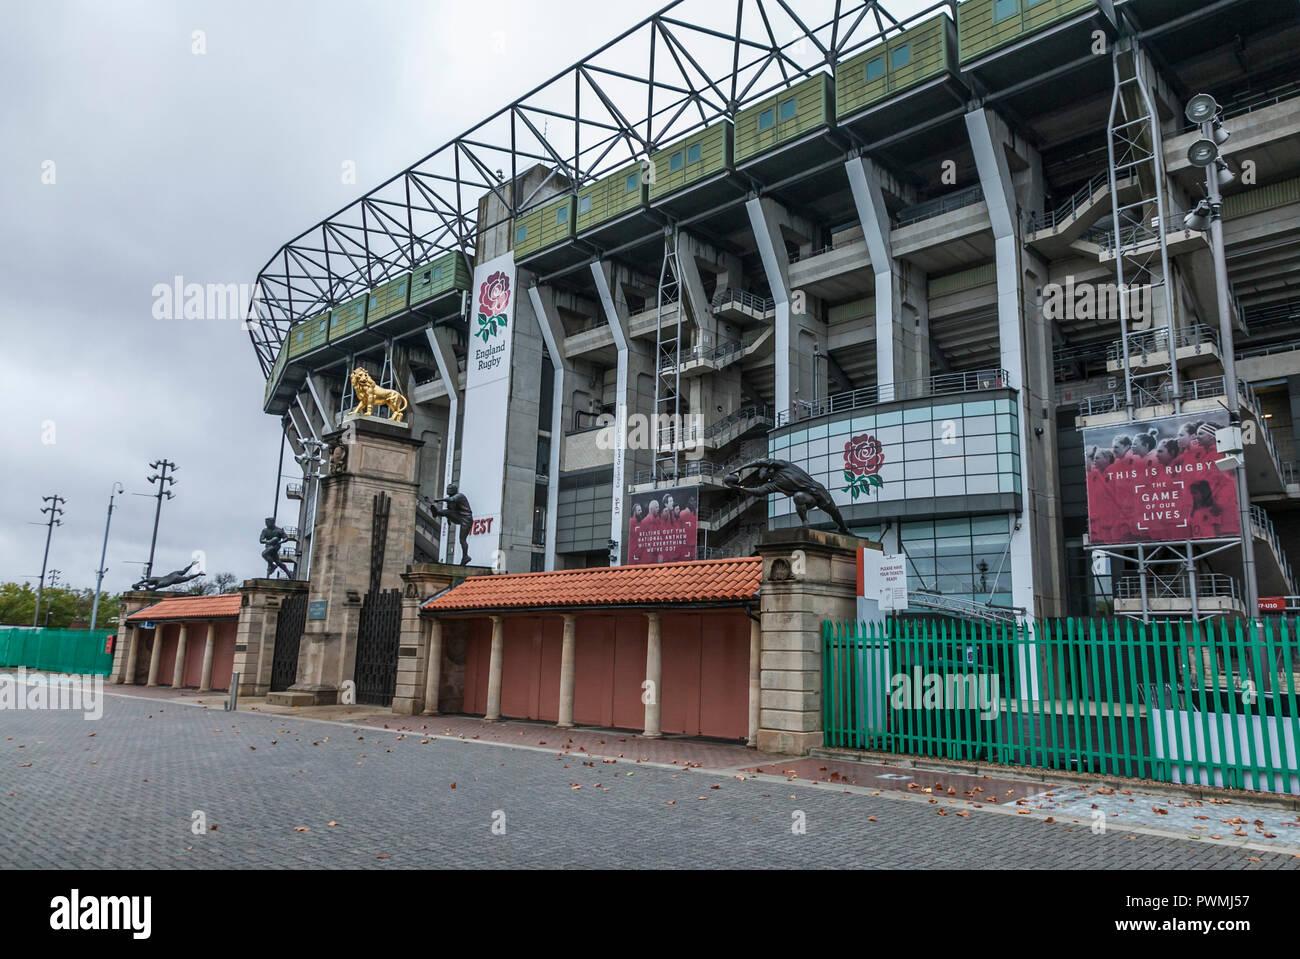 Twickenham Stadium, home of English Rugby, in London,England,UK - Stock Image